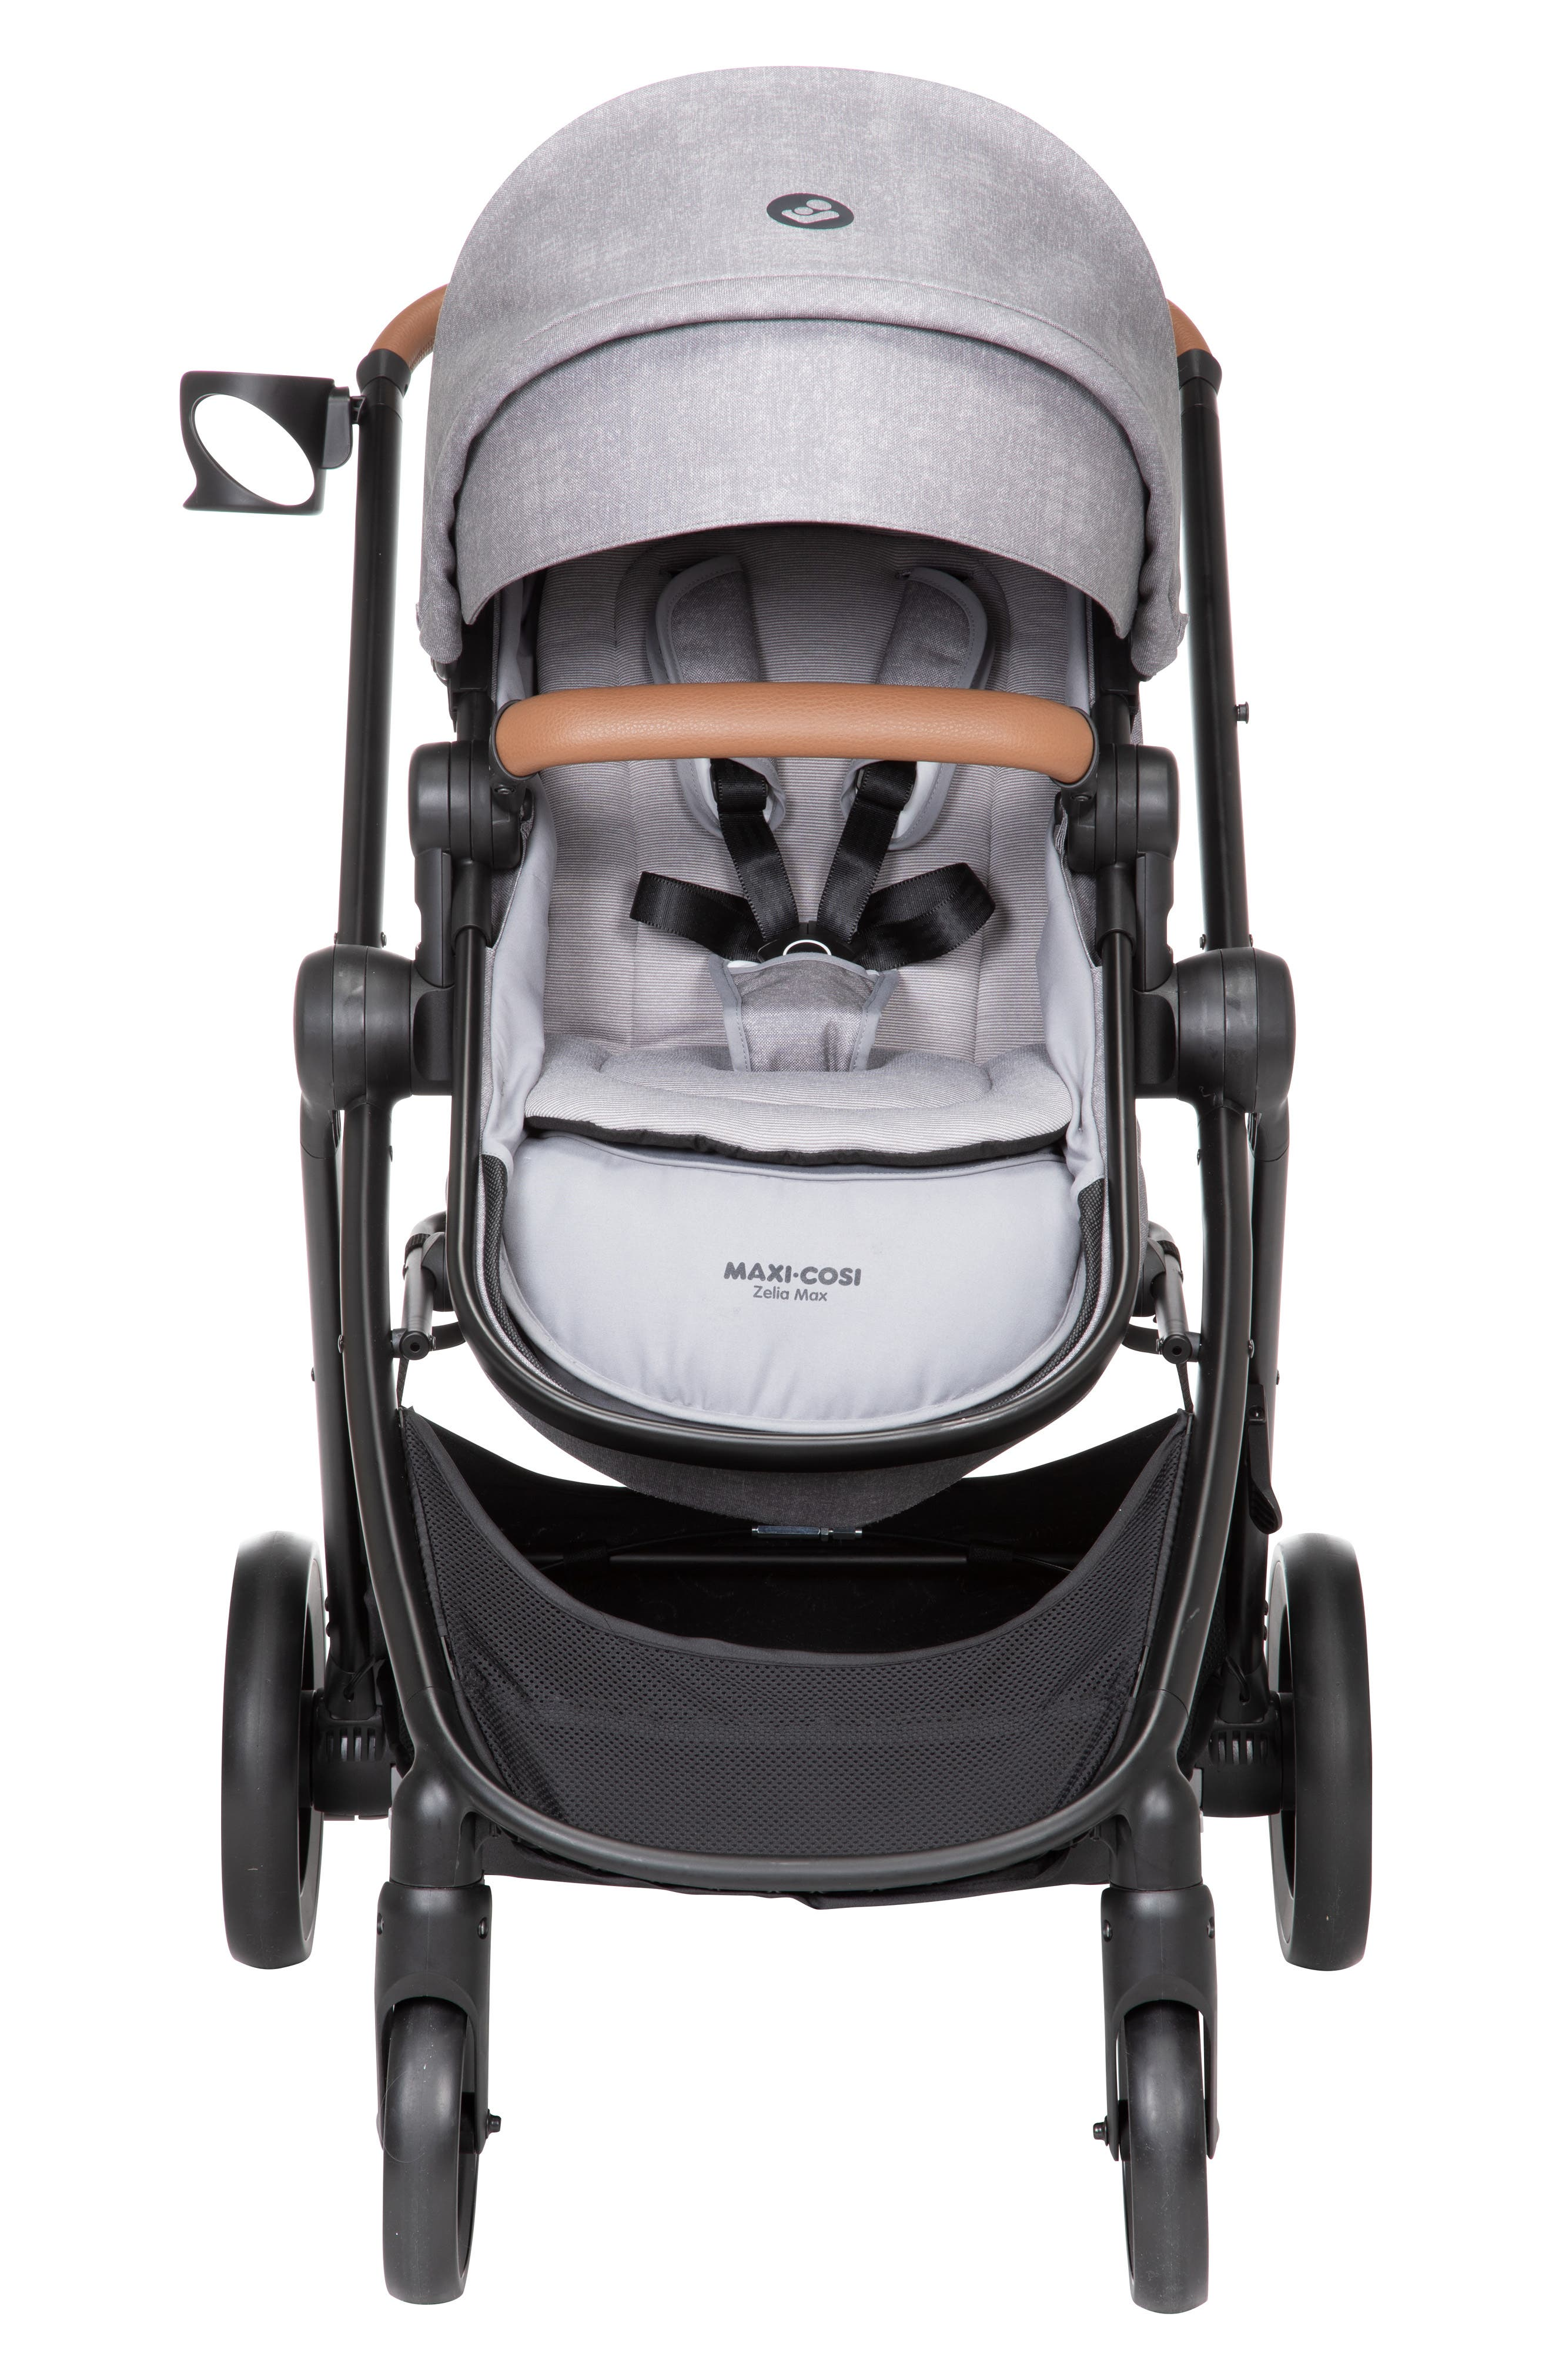 Infant MaxiCosi 51 Mico 30 Infant Car Seat  Zelia Stroller Modular Travel System Size One Size  Grey